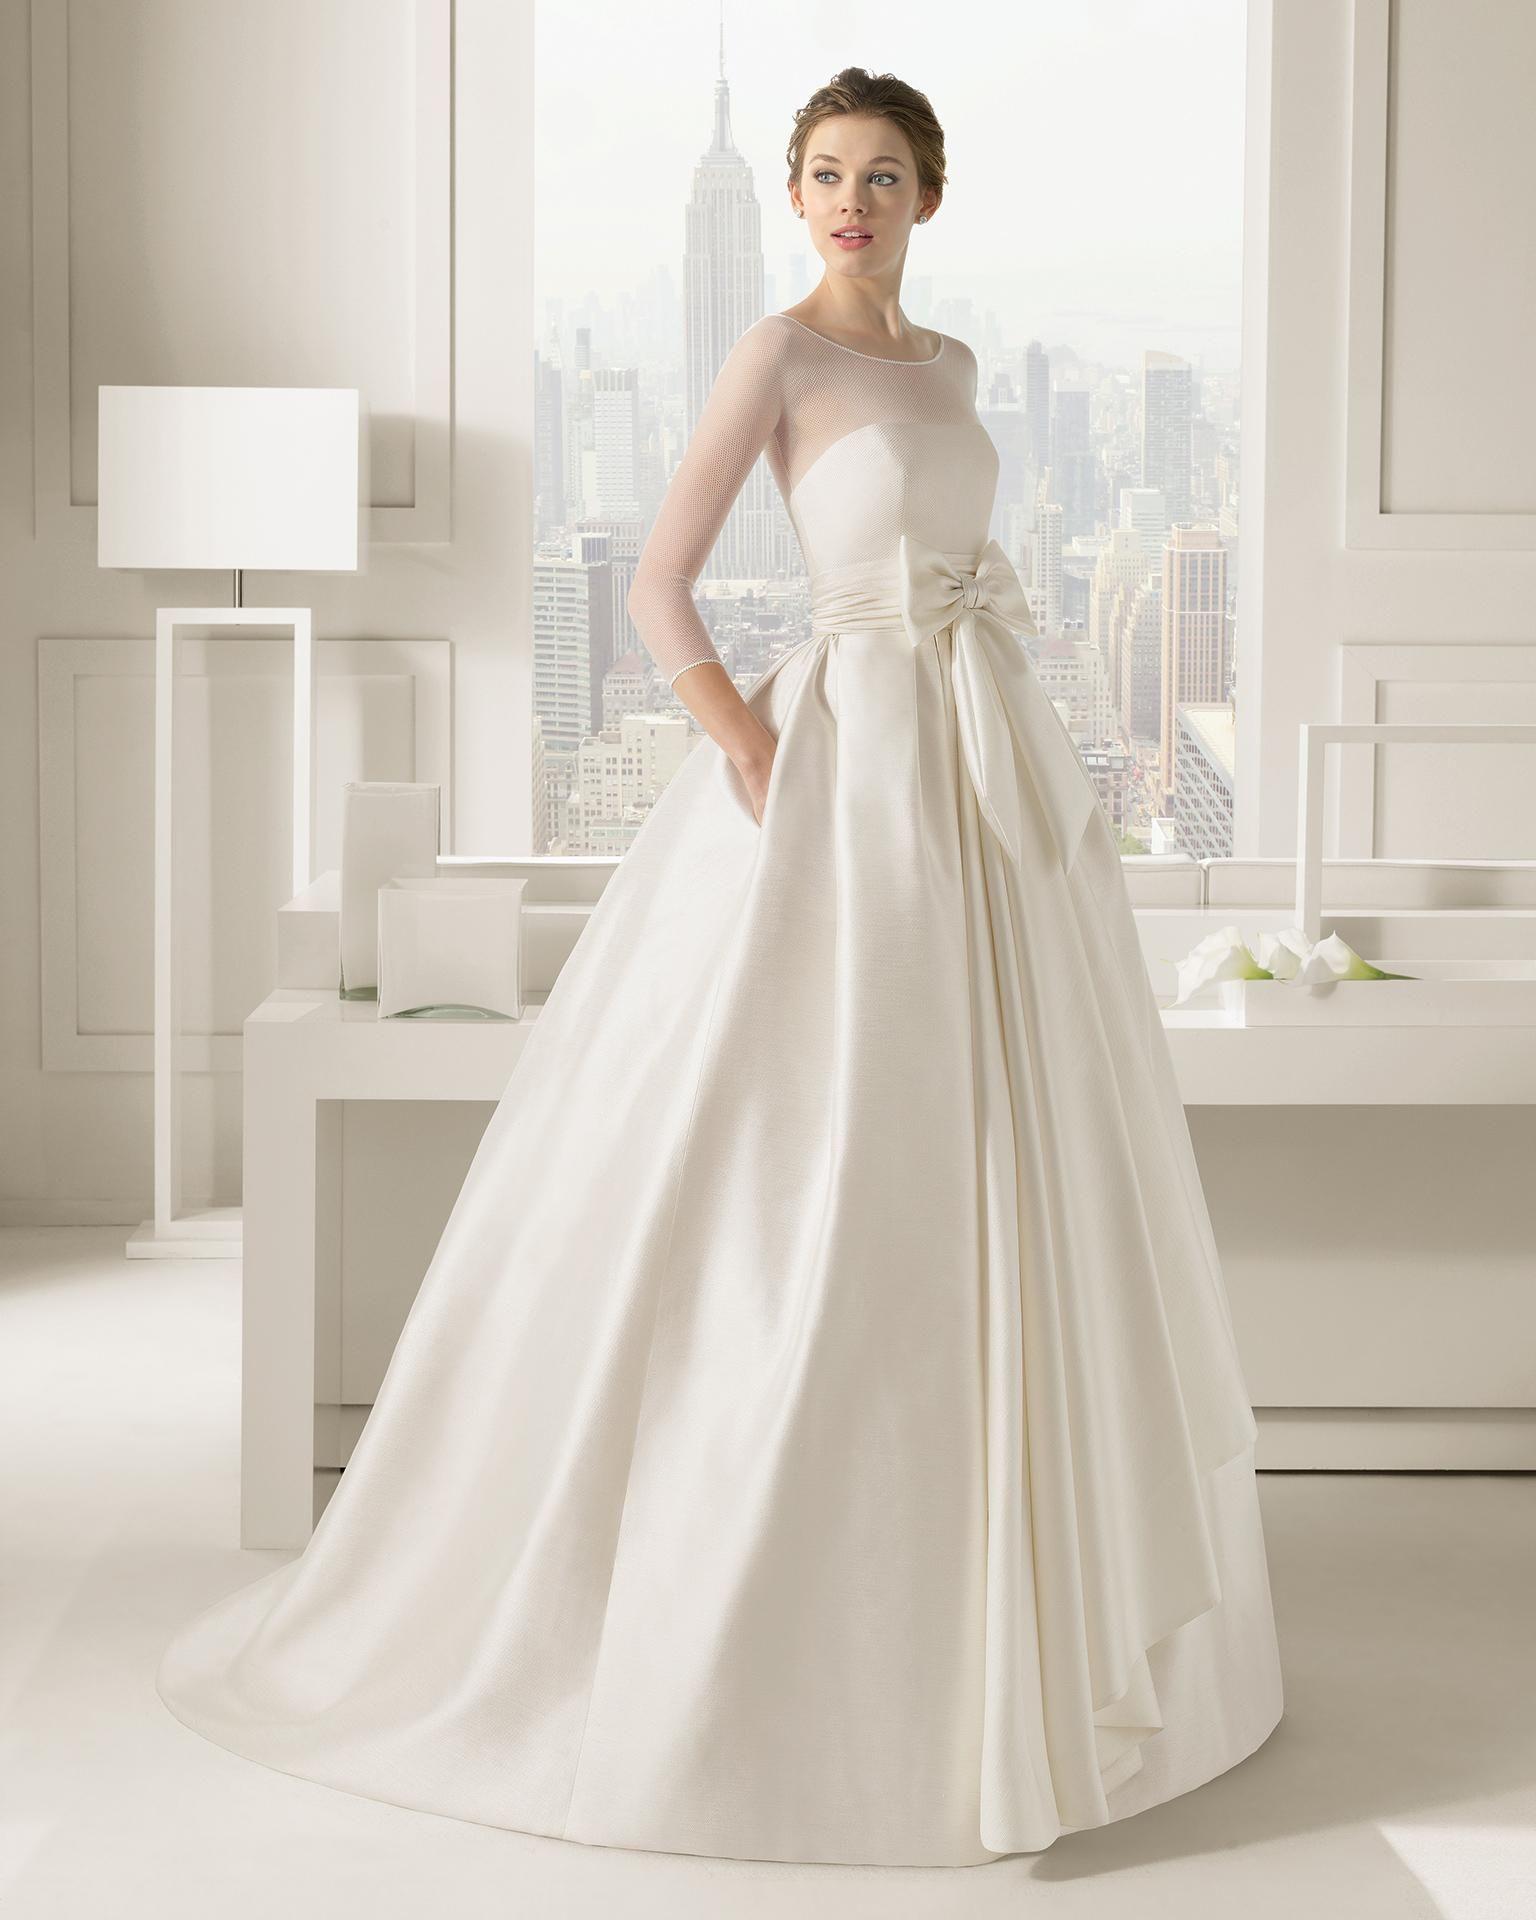 2016 Elegant Wedding Dresses With Jewel Neckline 3 4 Long Sleeve